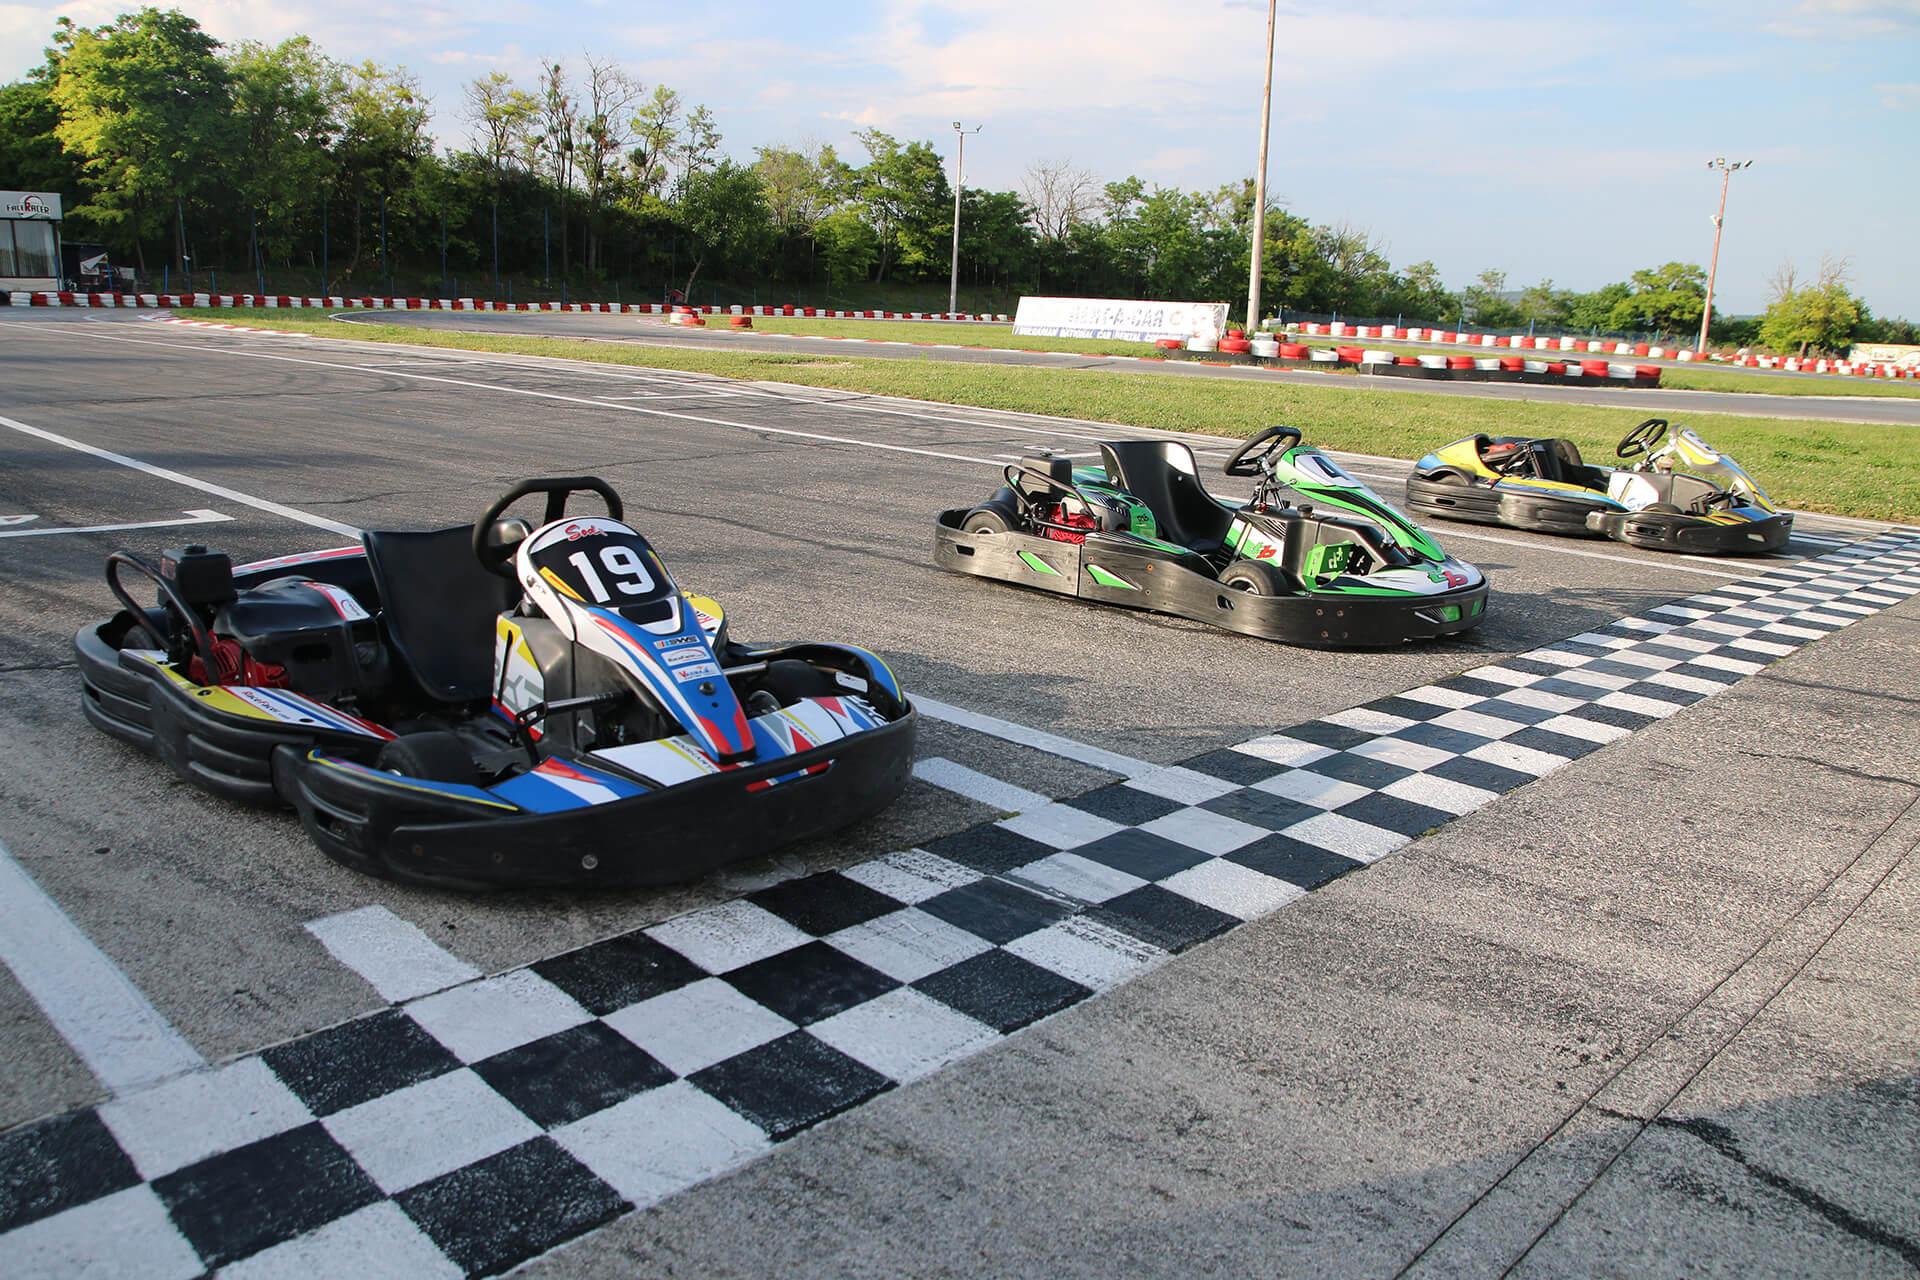 Varna-karting-gokarts-fleet